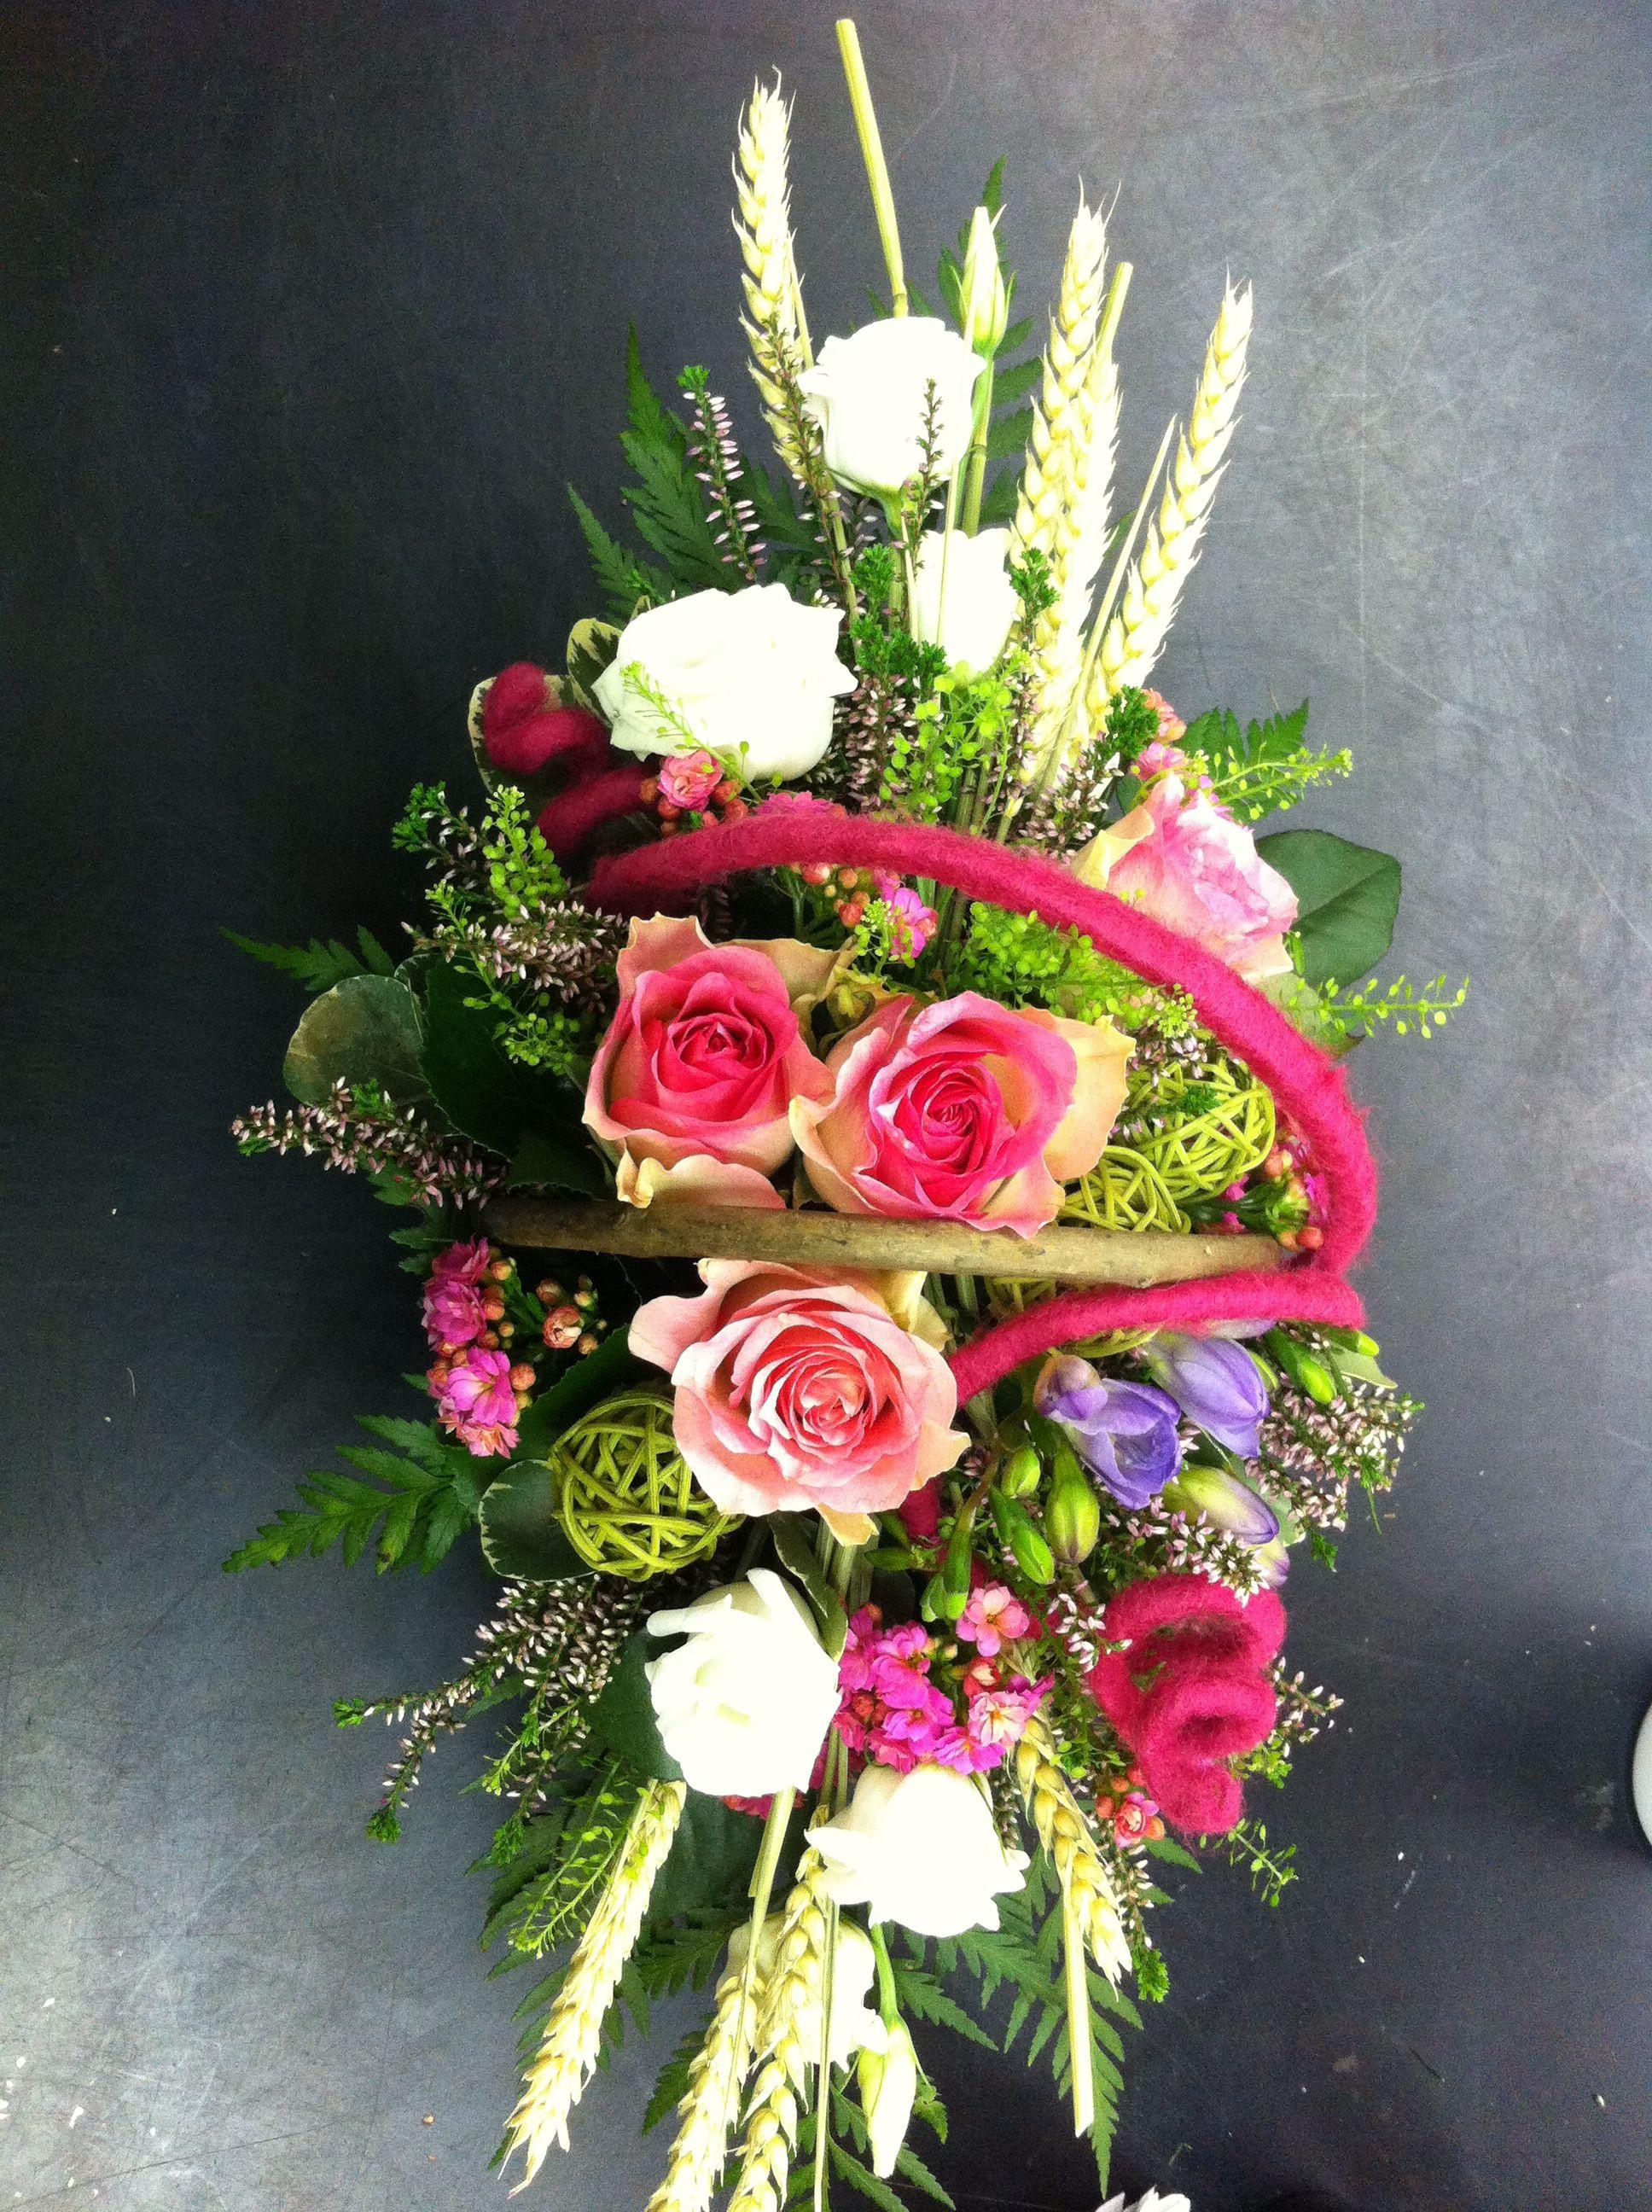 cesto di fiori freschi primaverile rose fresie lisianthus erica e spighe